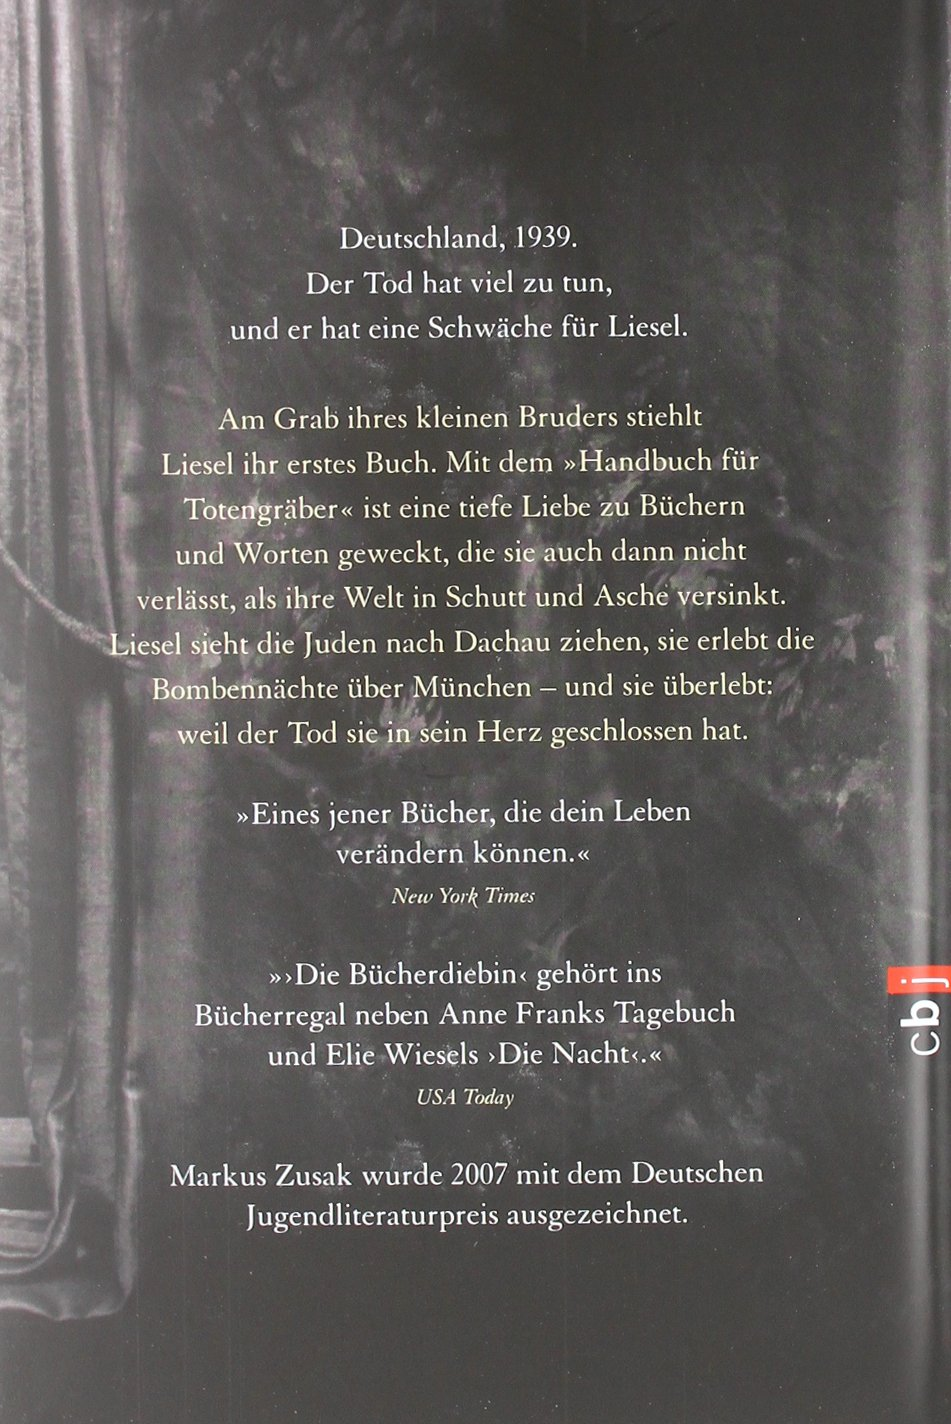 Die Bücherdiebin: 9783570132746: Amazon.com: Books